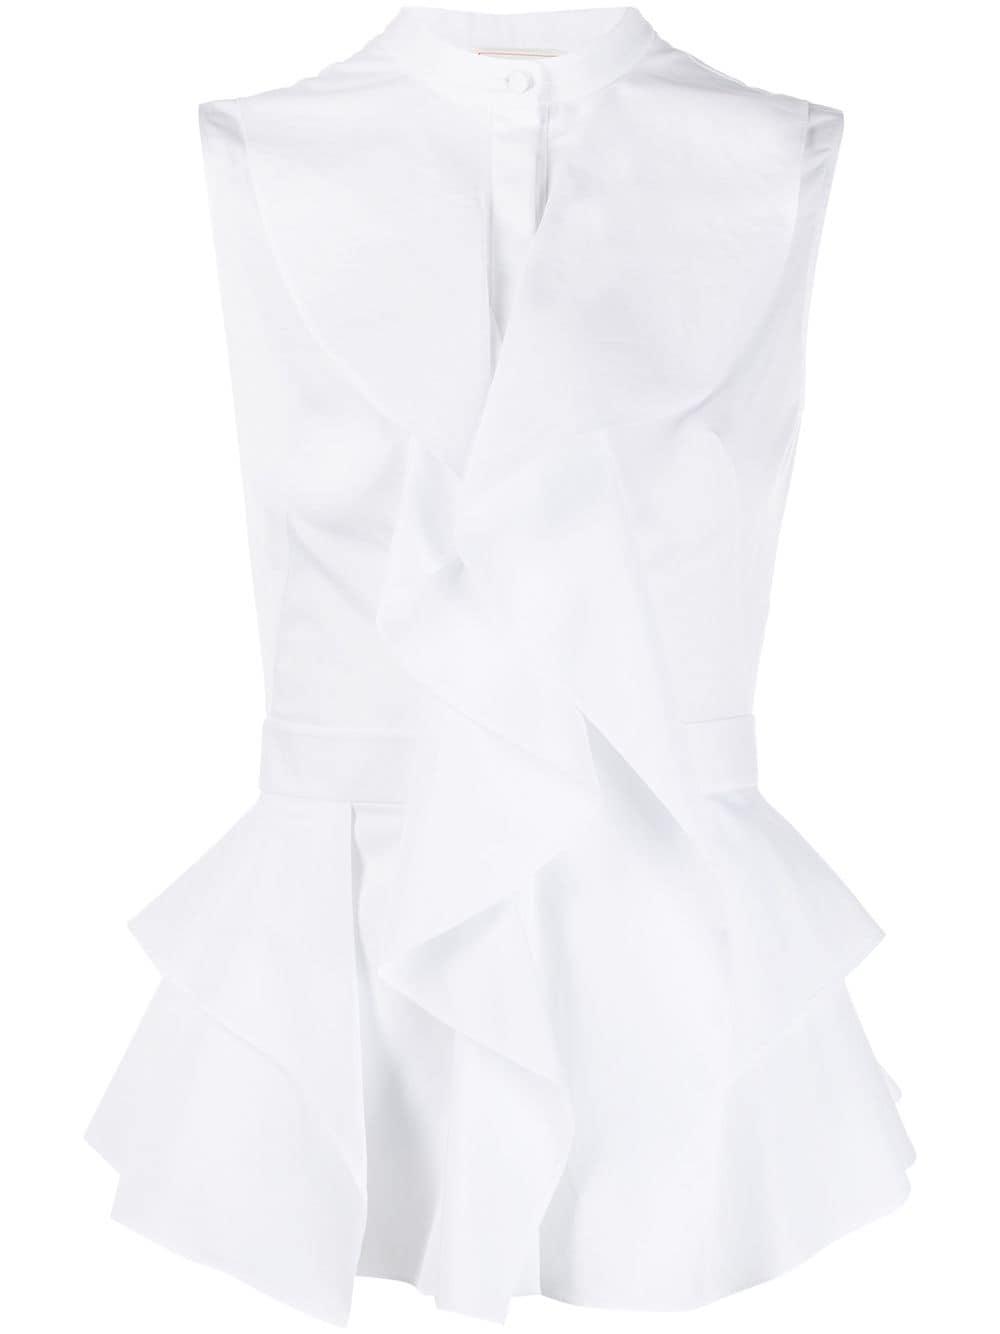 Sleeveless Ruffle Cotton Shirt